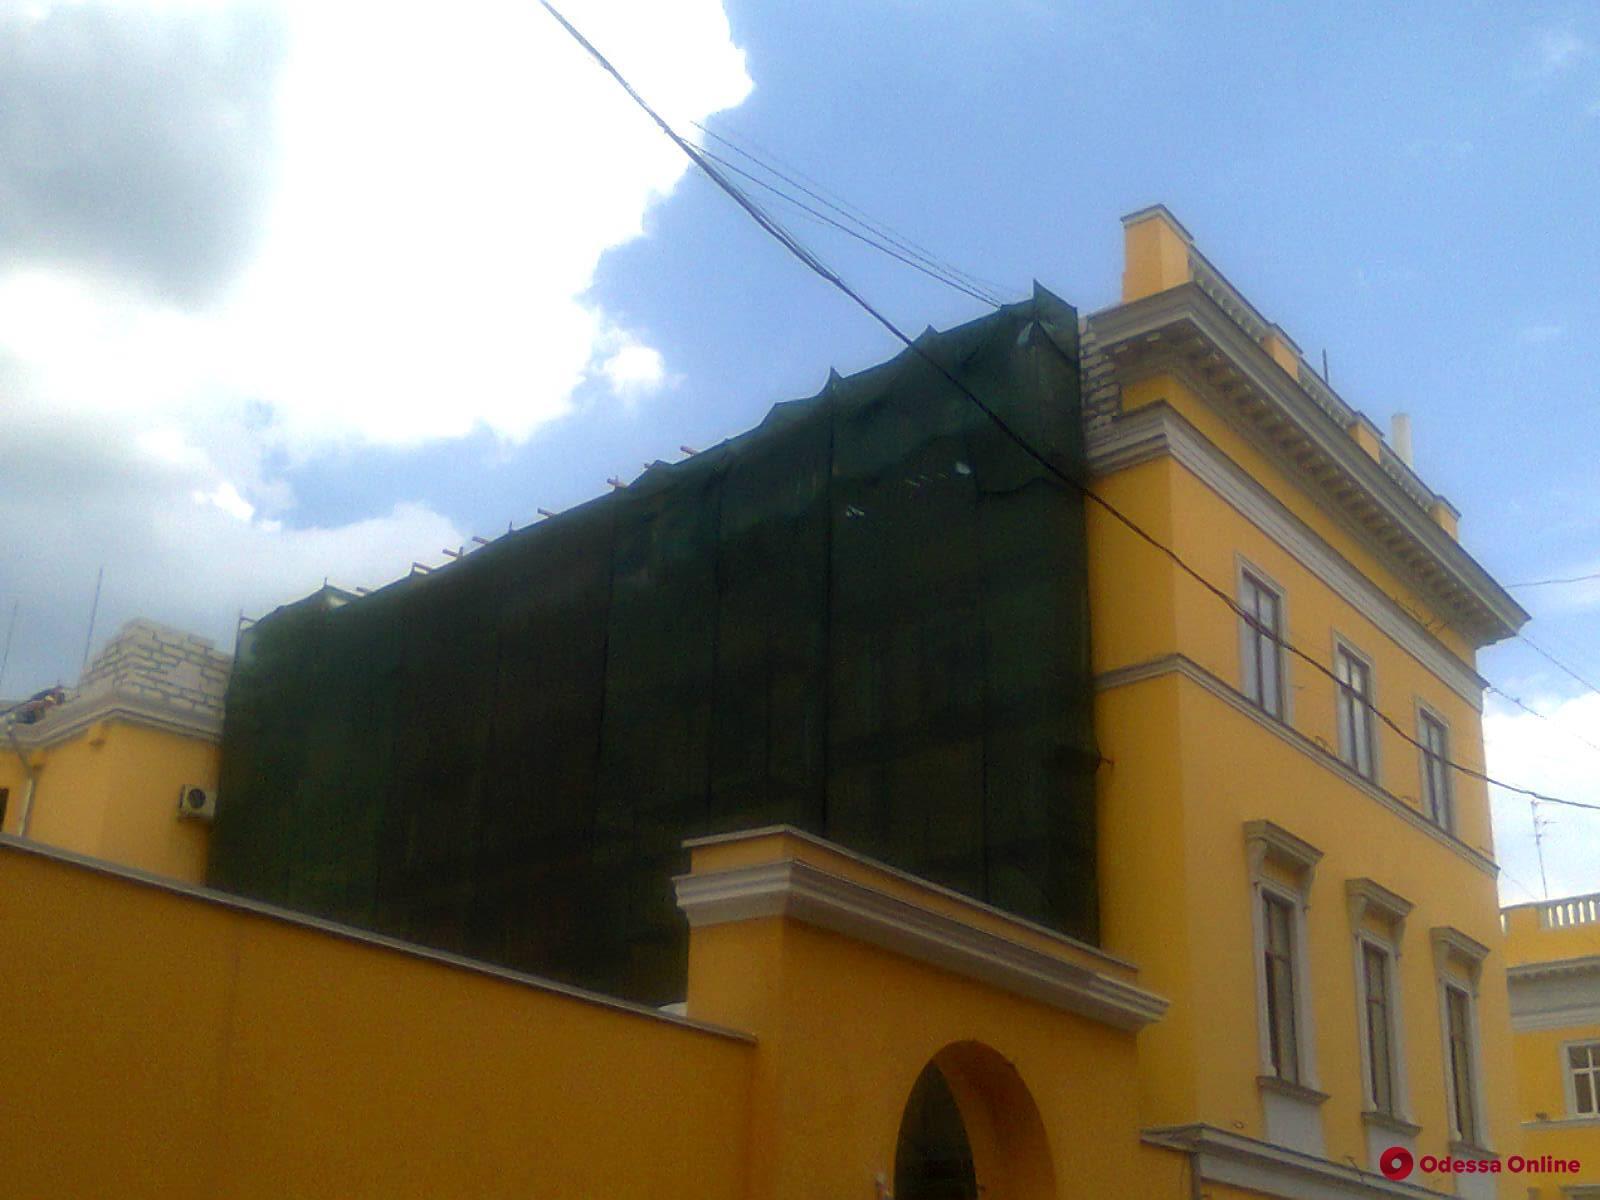 Апелляционный суд снял арест с памятника архитектуры на Приморском бульваре